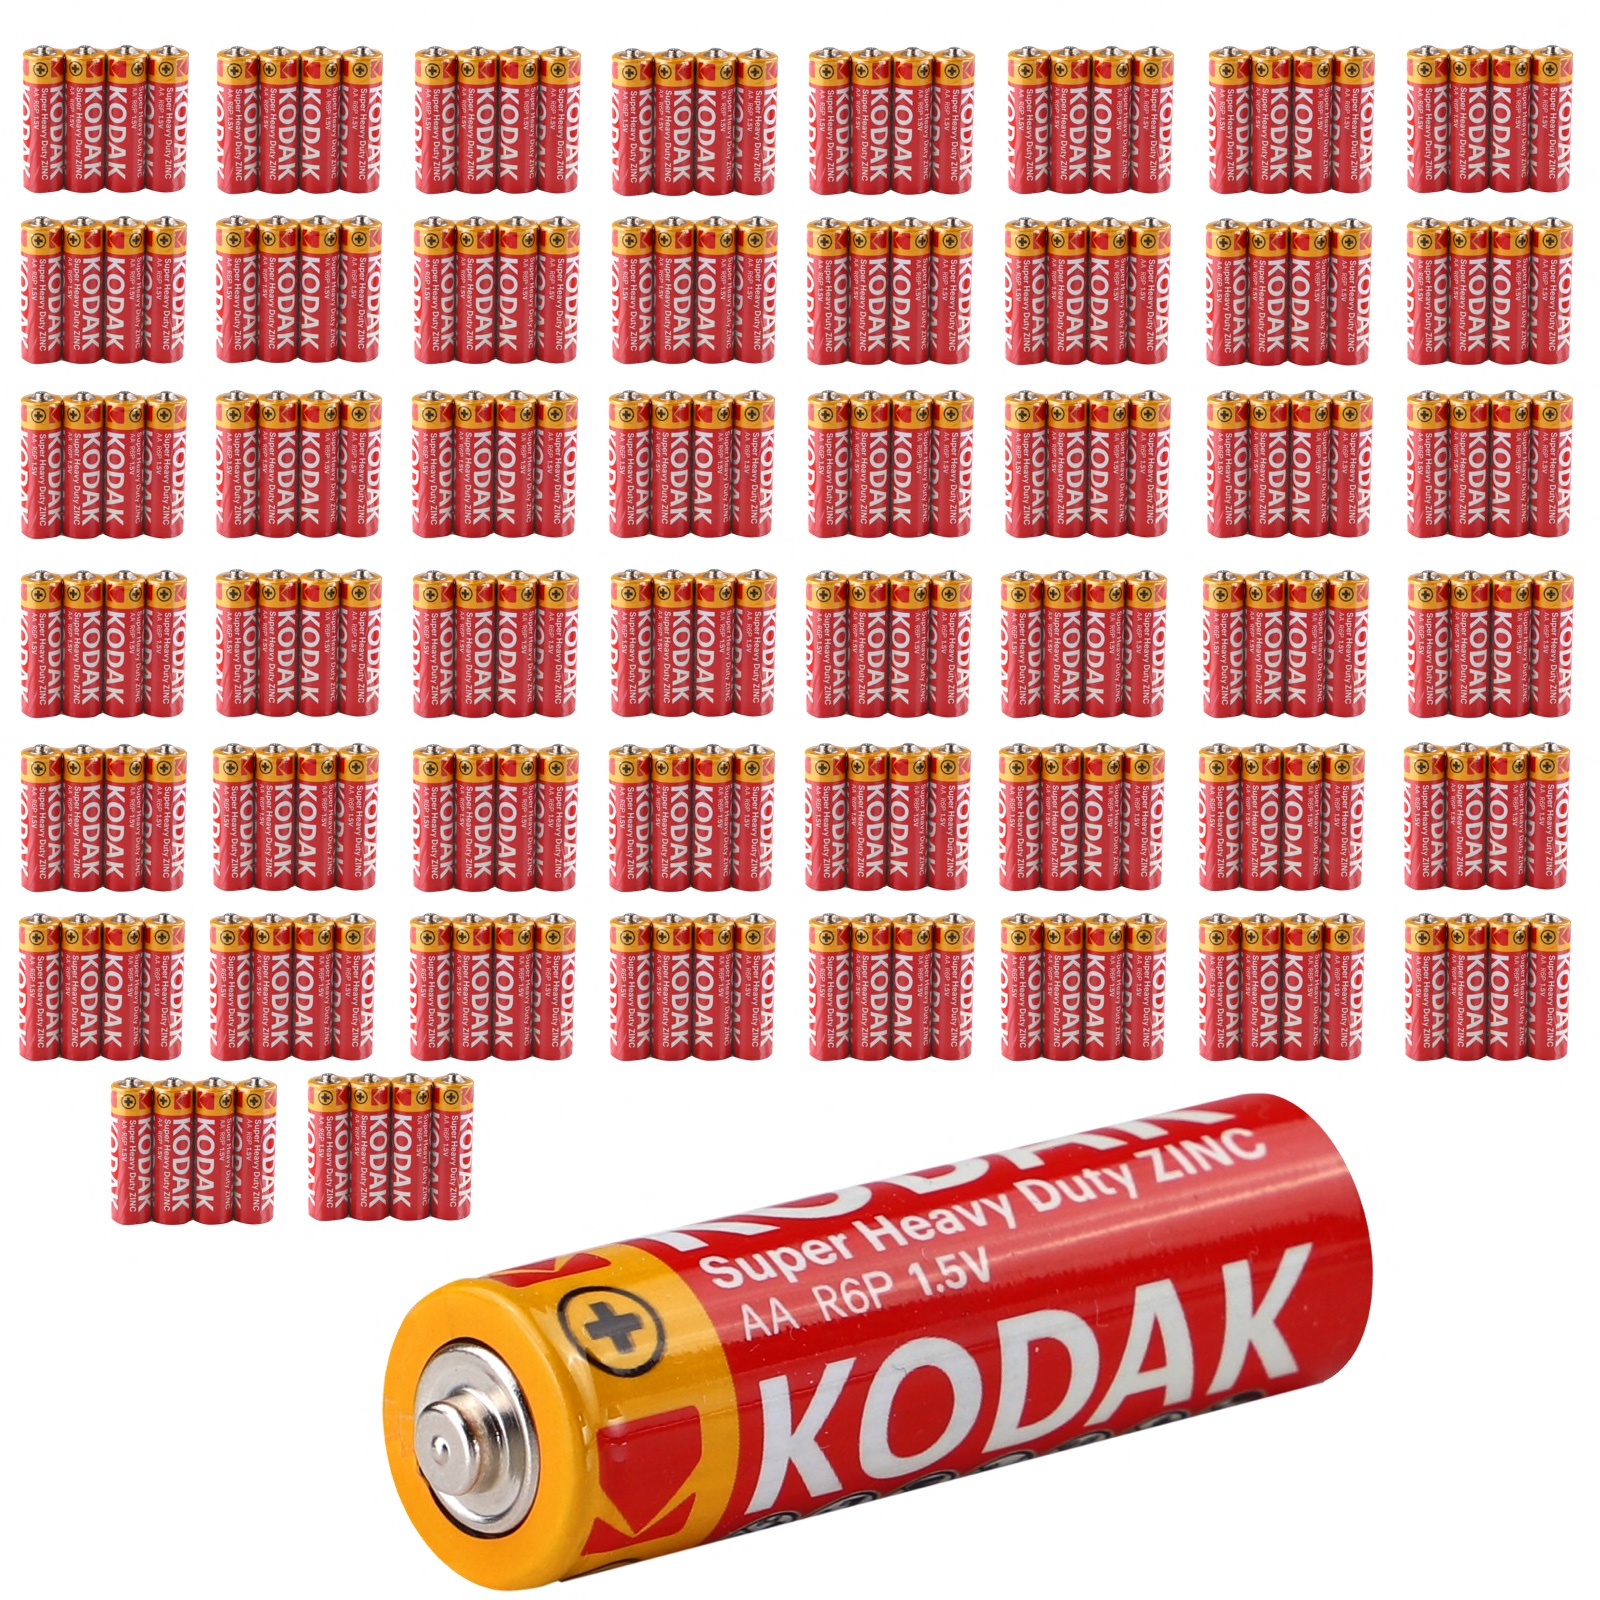 Kodak Super Heavy Duty AA Micro Batterien 1200mAh 1,5V LR06 AUSWAHL